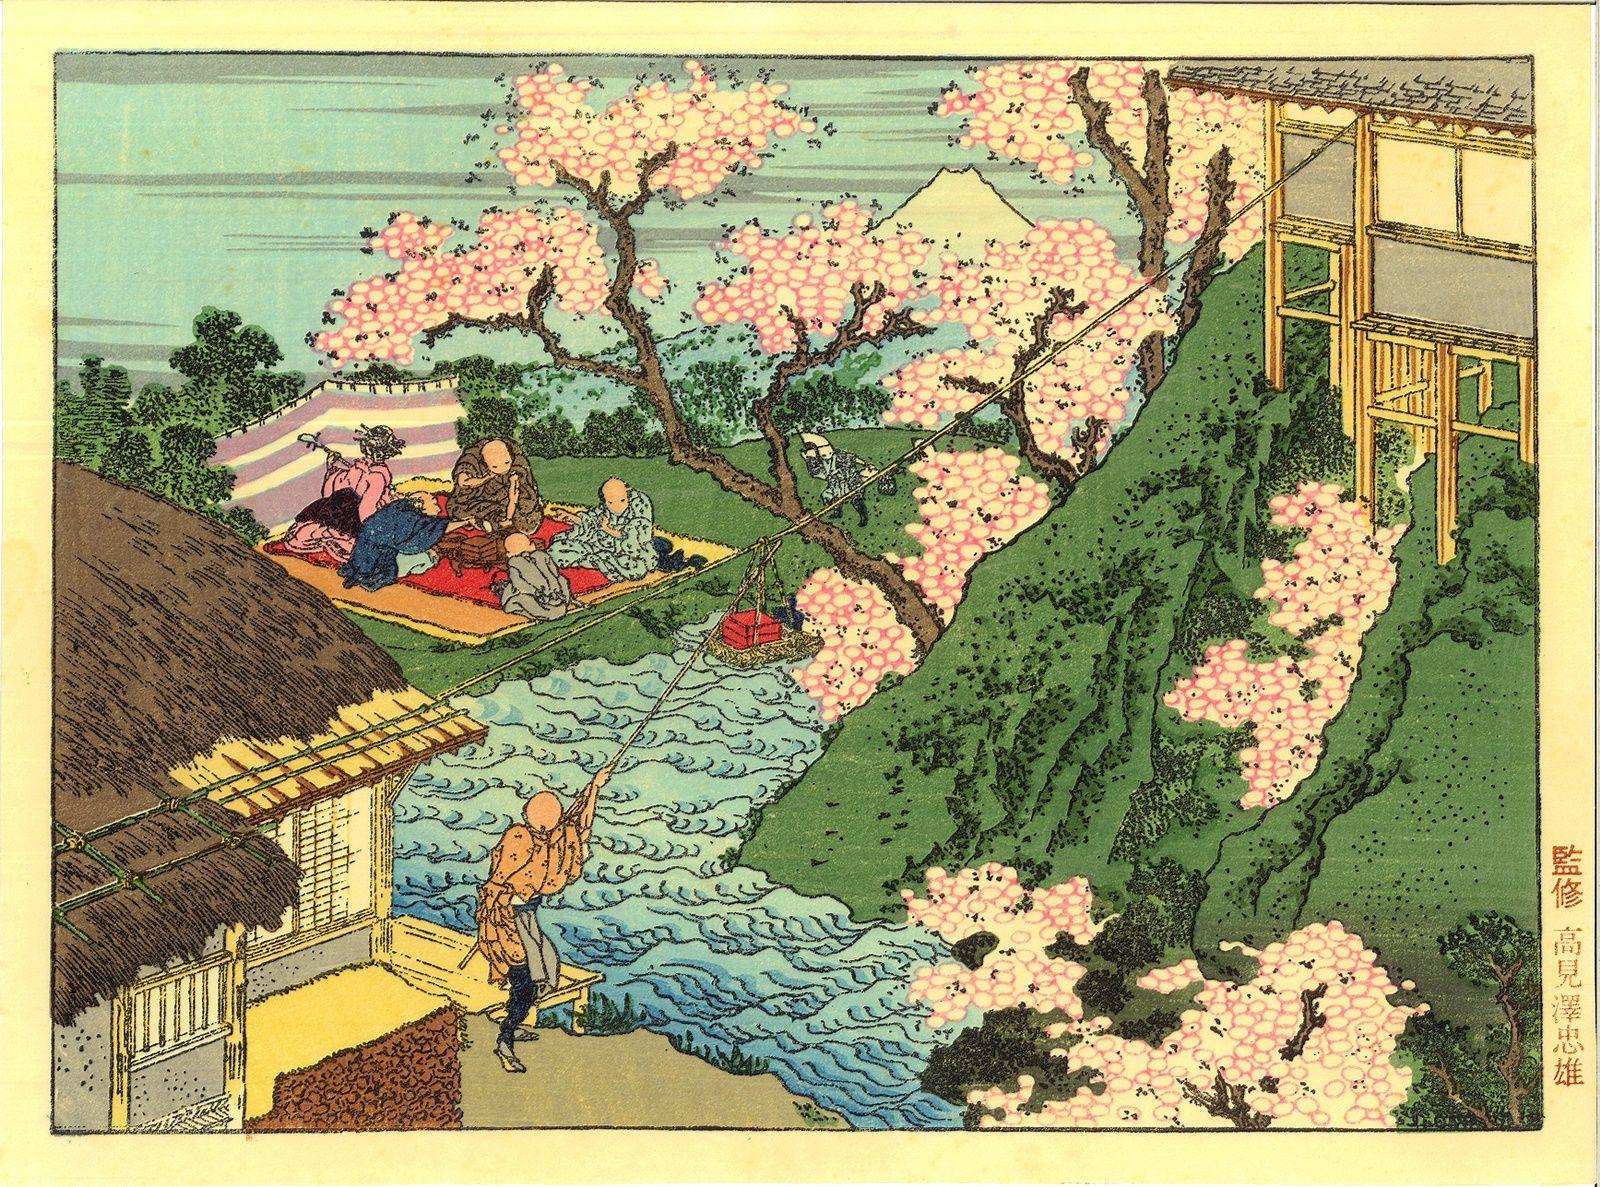 Grande vente promotionelle spéciale estampes HOKUSAI